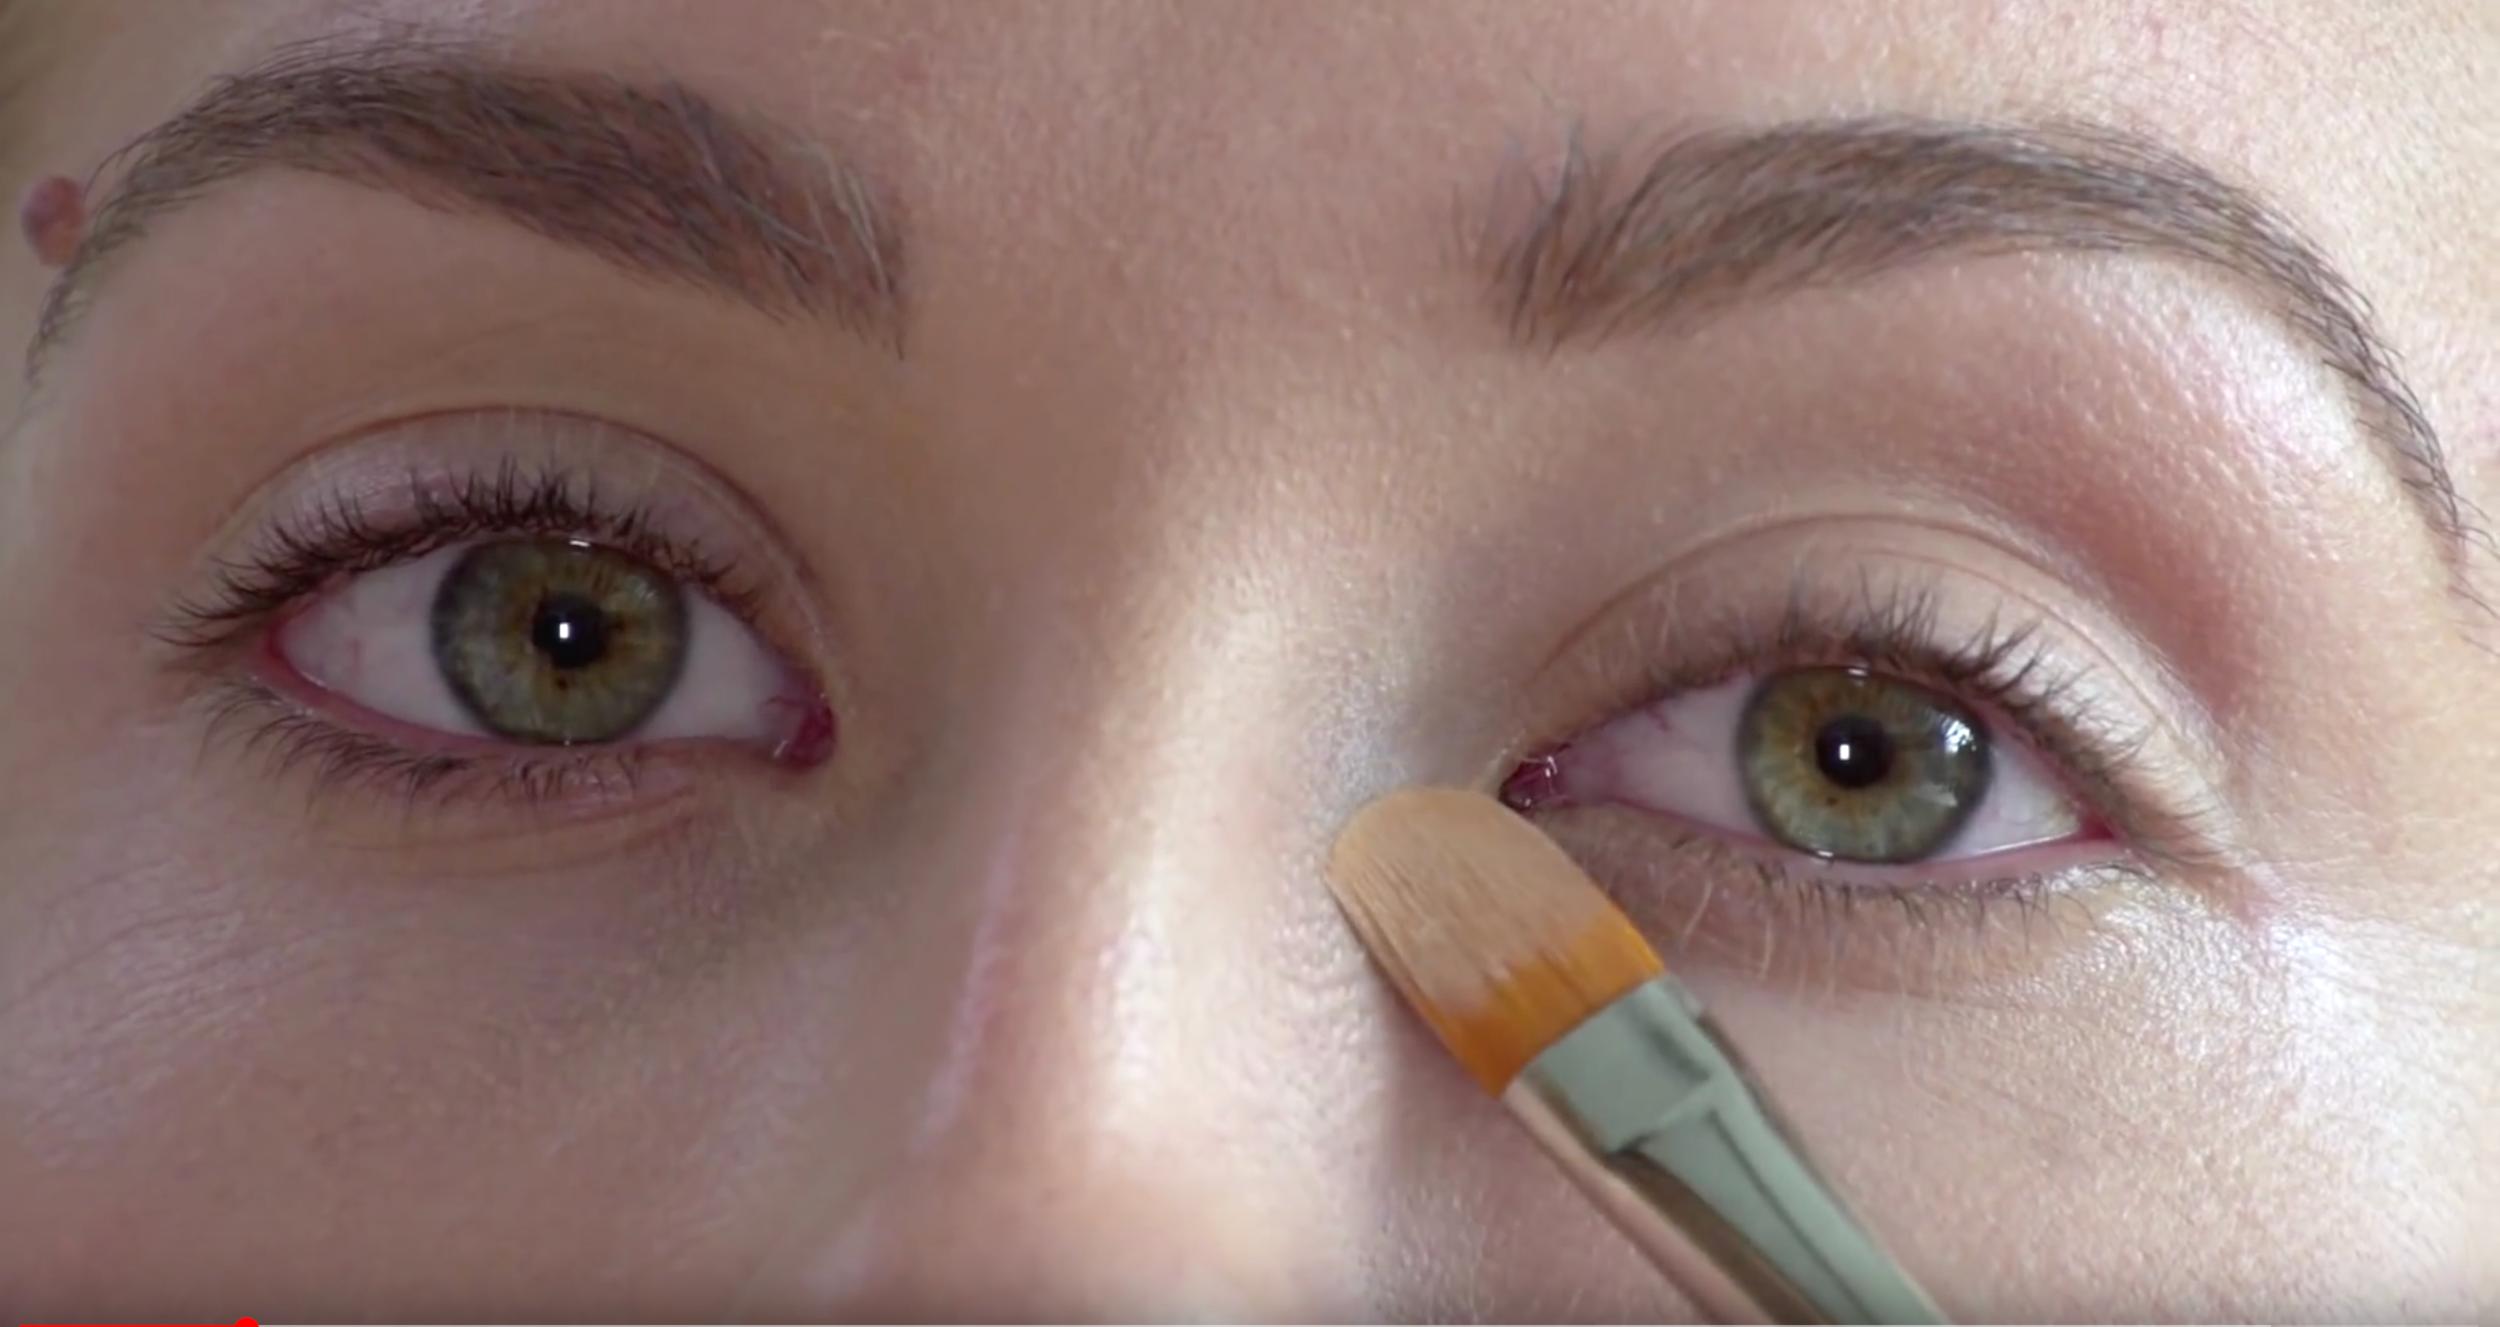 Natural Eye Makeup | Natural Beauty | Whole Foods Market